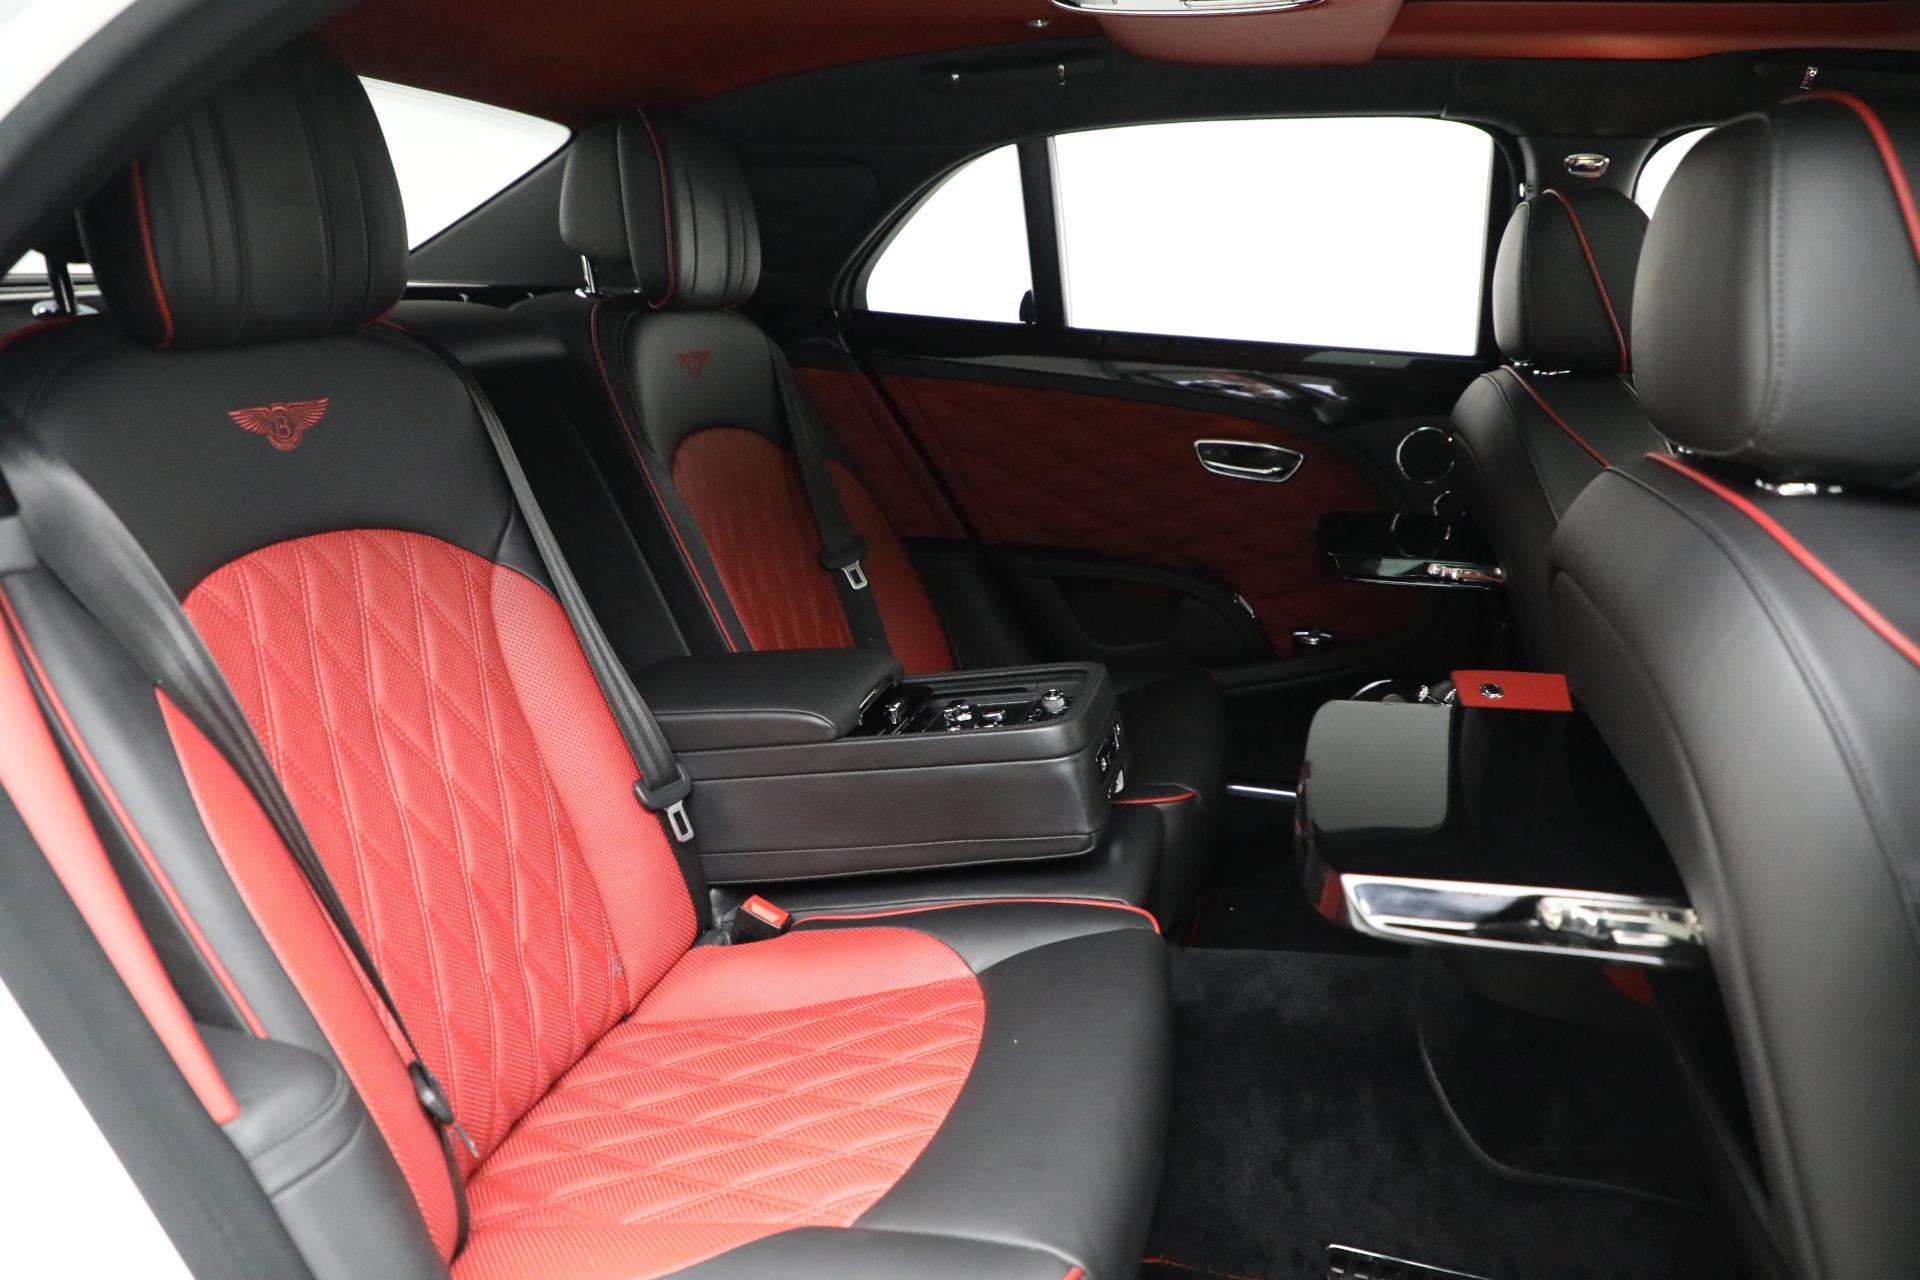 Used 2018 Bentley Mulsanne Speed For Sale In Westport, CT 2075_p26